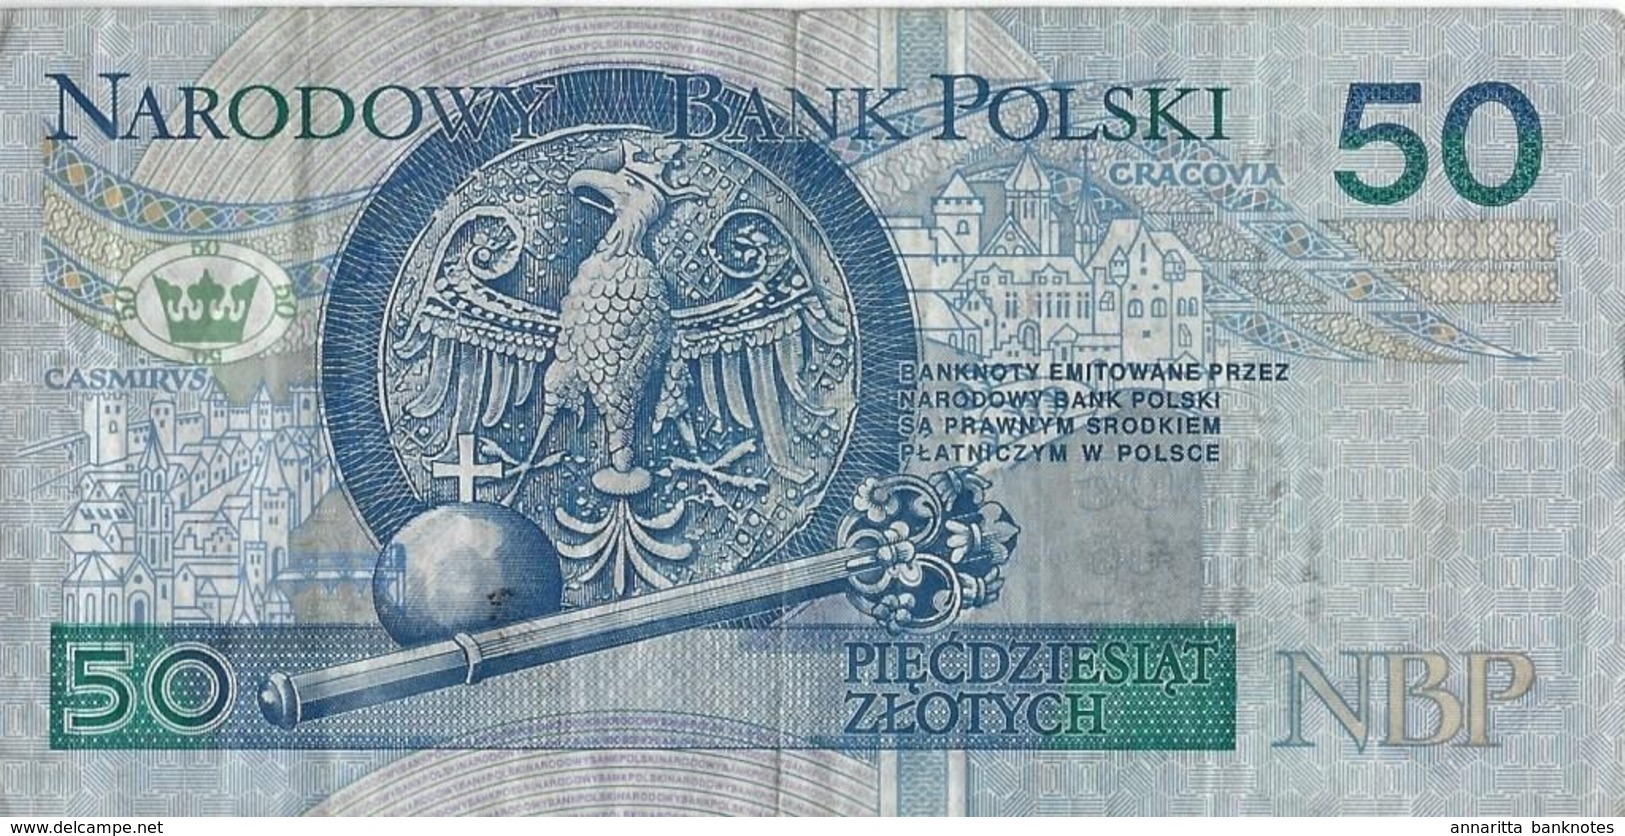 POLAND 50 ZŁOTYCH 1994 (1995) P-175a G/VG CIRC. AT FACE VALUE [PL856a] - Poland